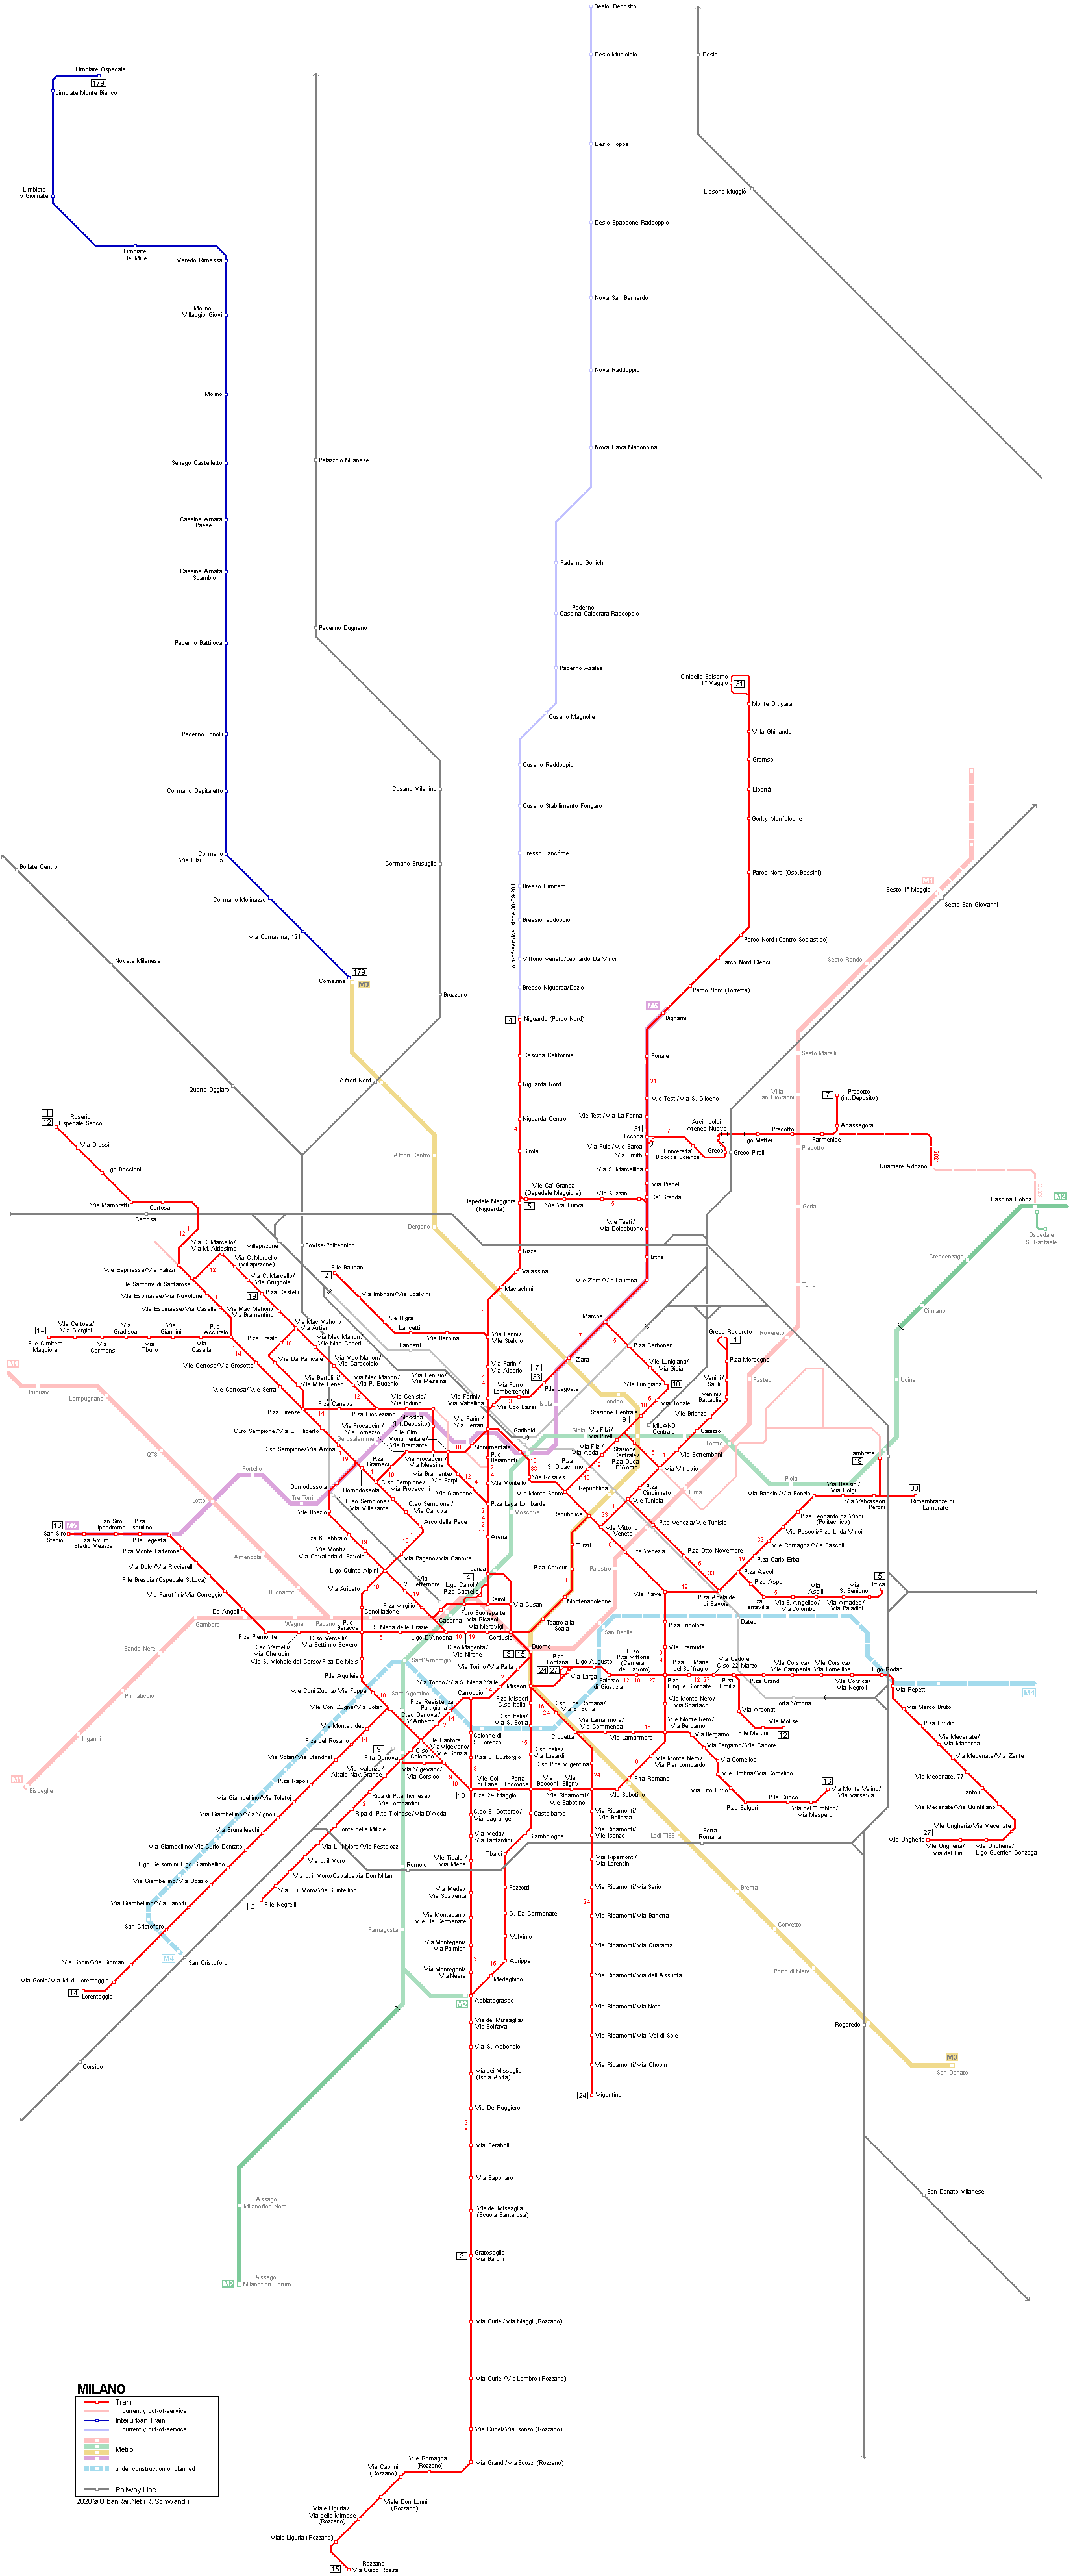 UrbanRailNet Milan Tram Network Map